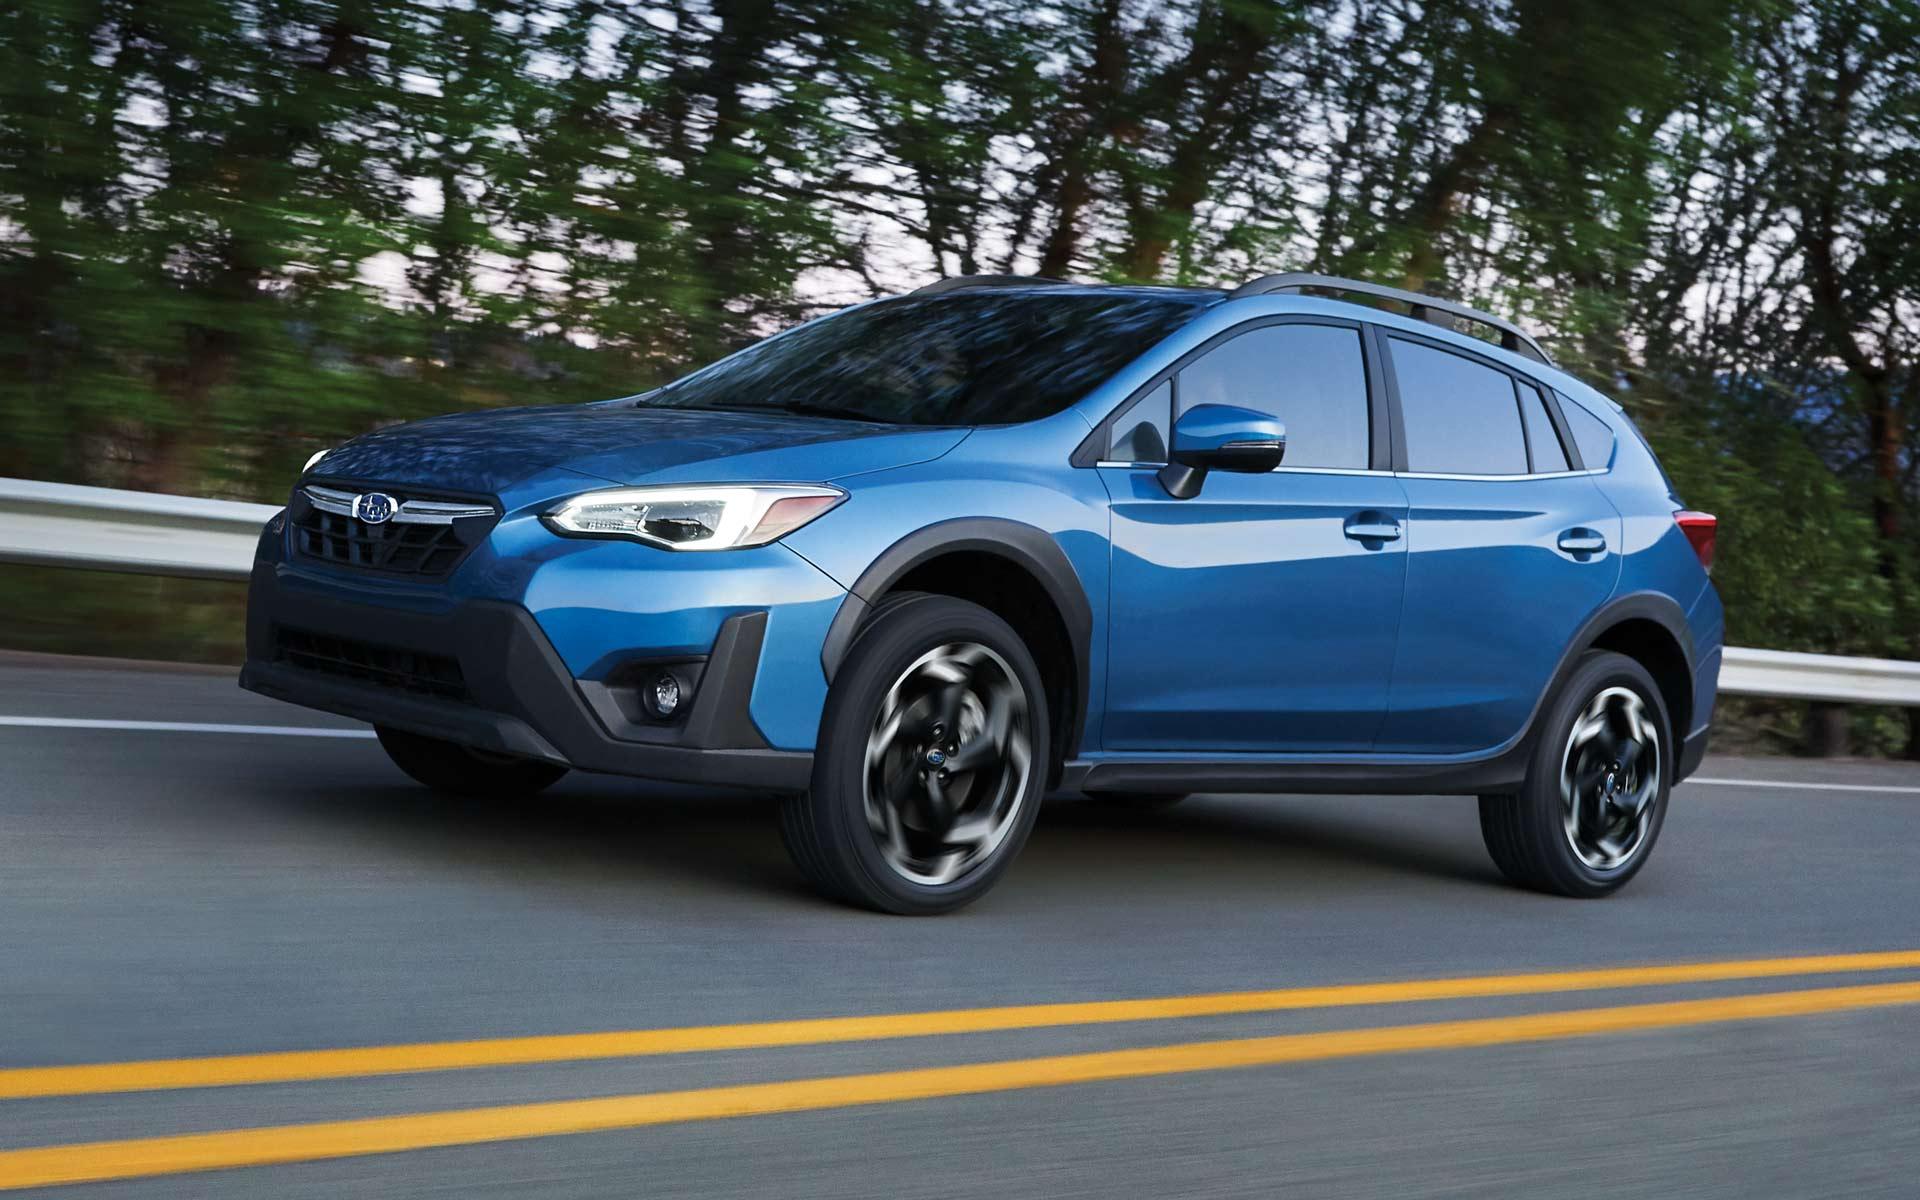 The New 2021 Subaru Crosstrek Is Both Safe and Adventure-Ready in Bay City, MI